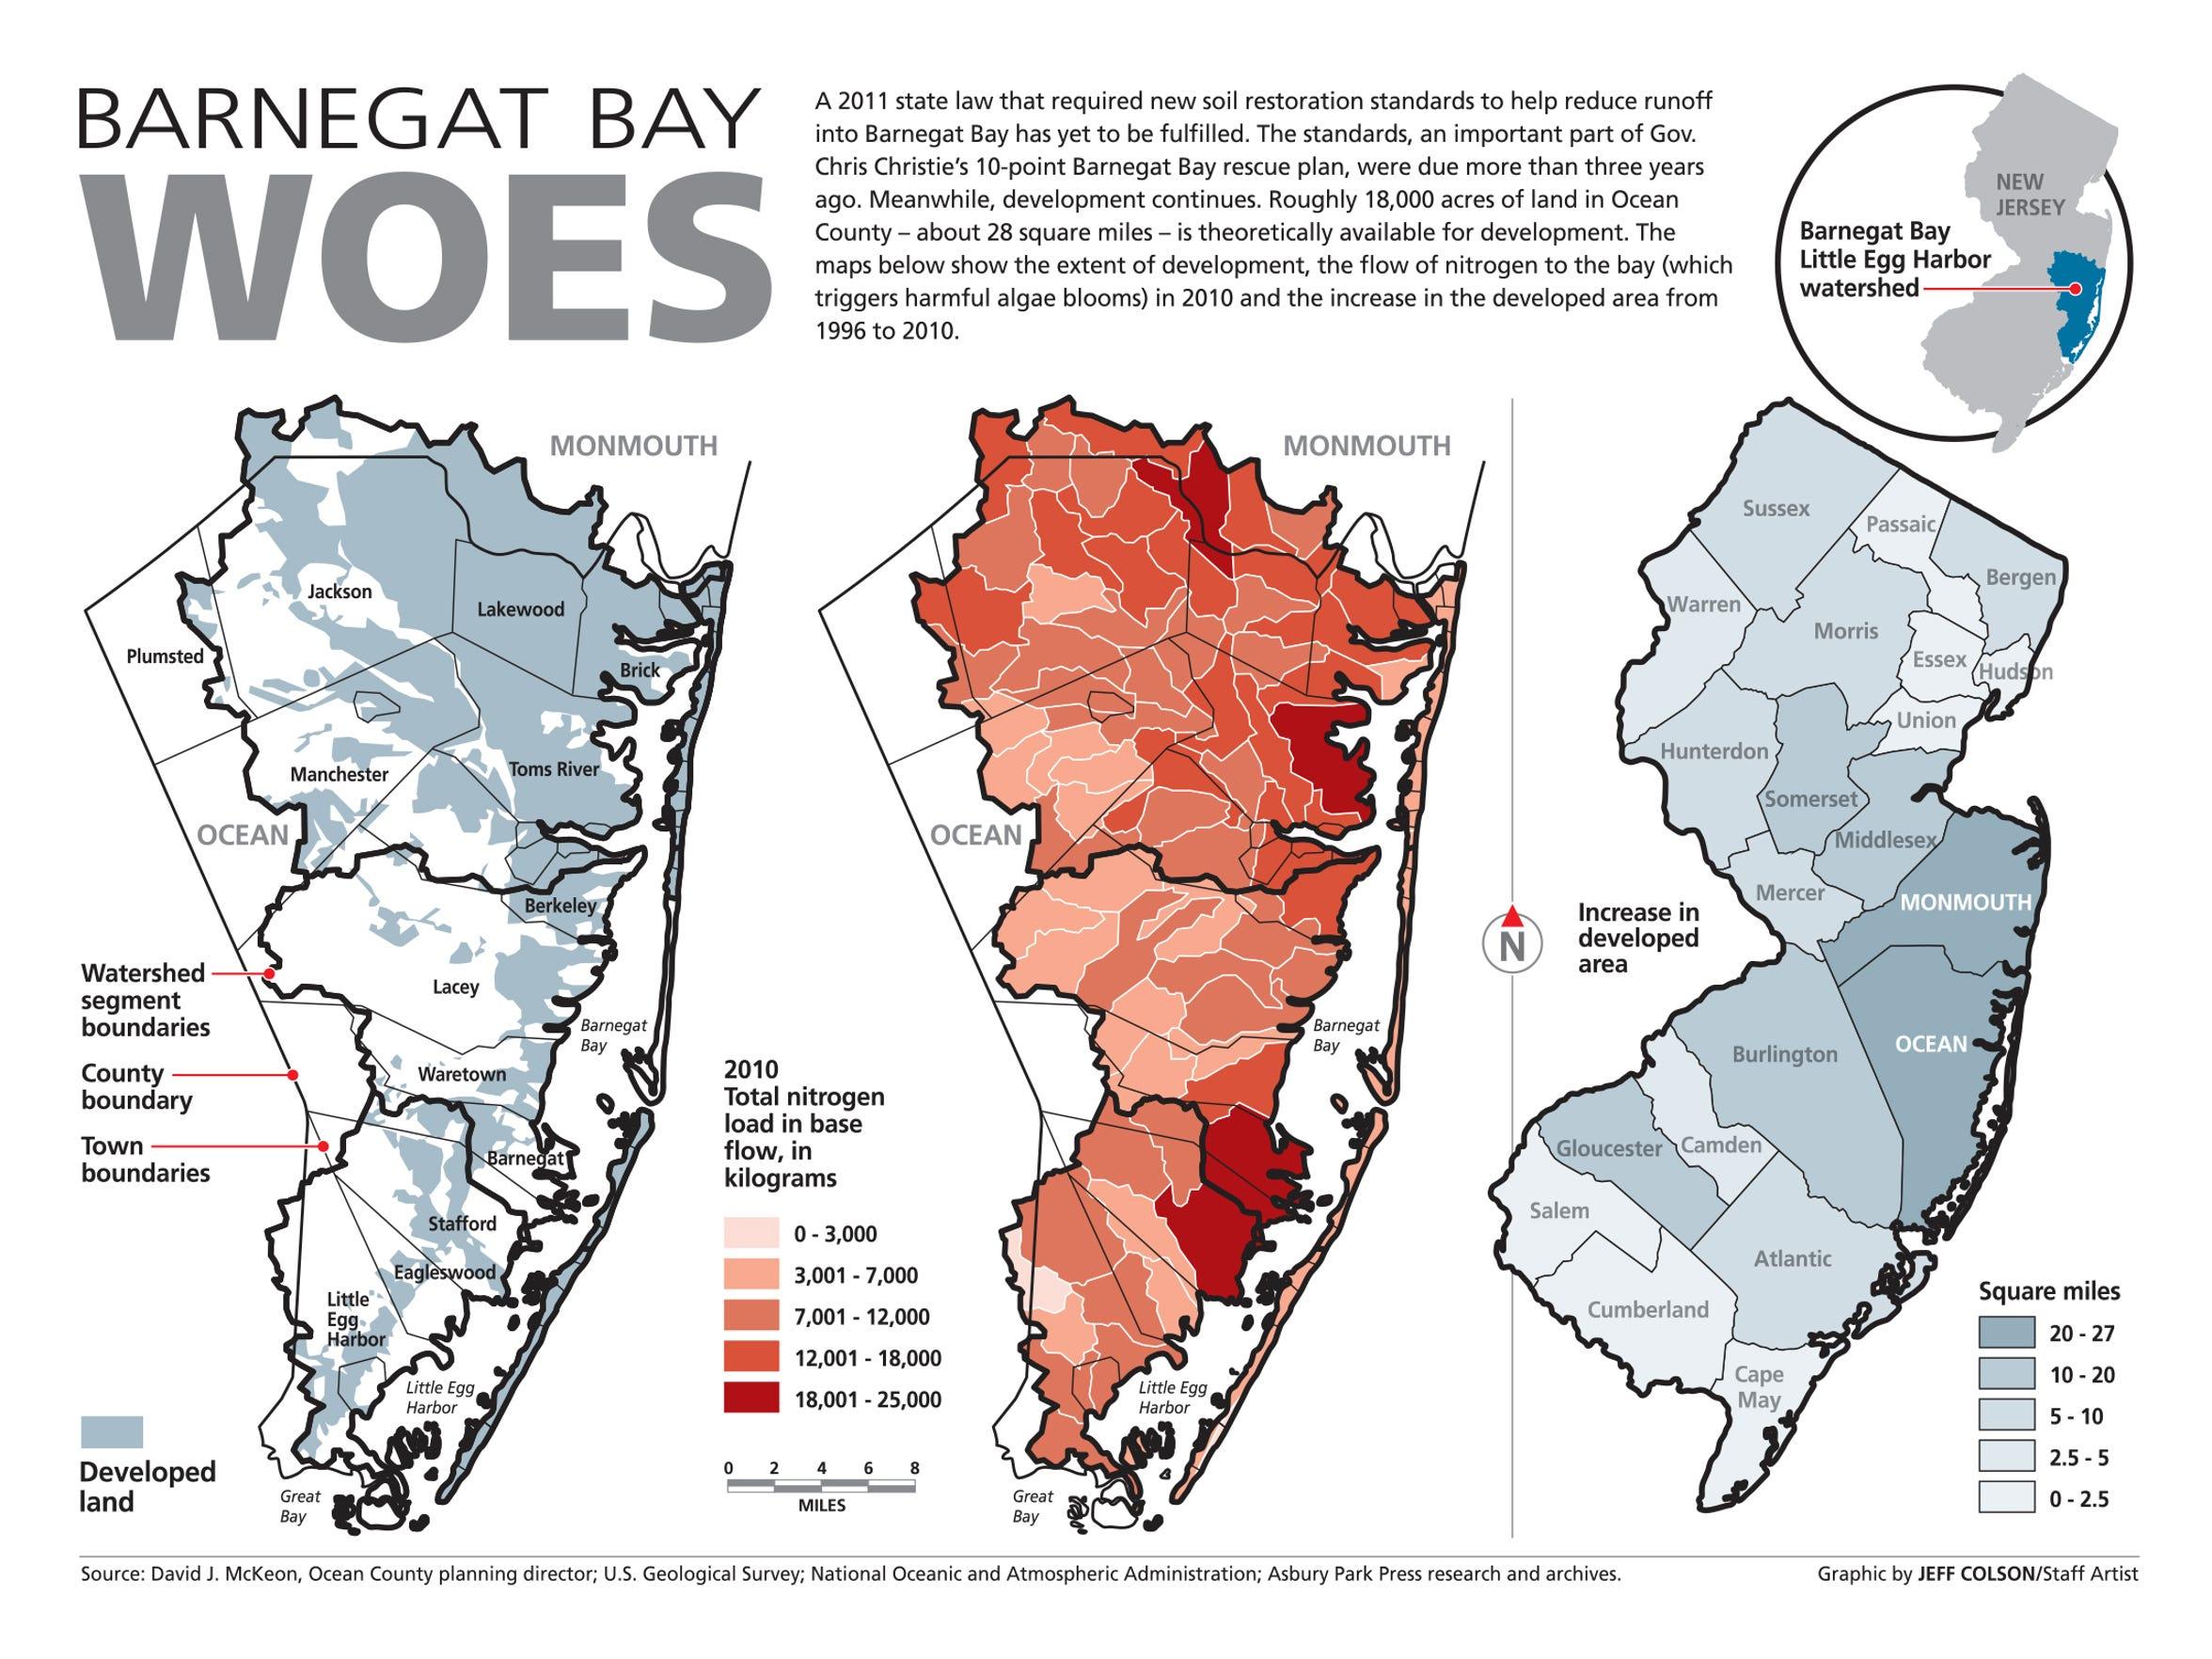 Barnegat Bay woes